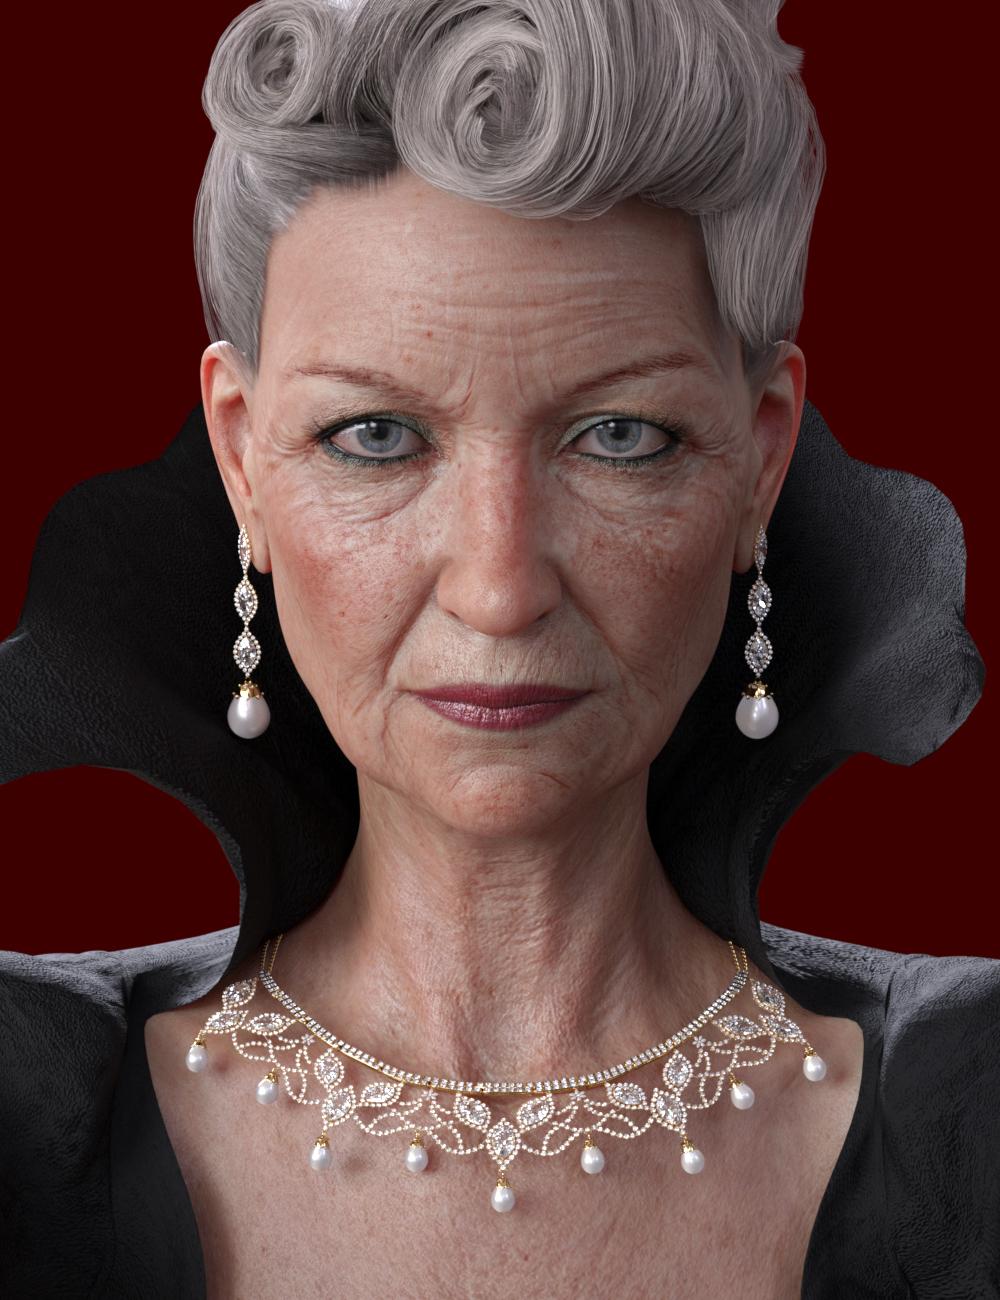 Regal Jewels for Genesis 8 Female(s) by: Titan XiVirtual_World, 3D Models by Daz 3D